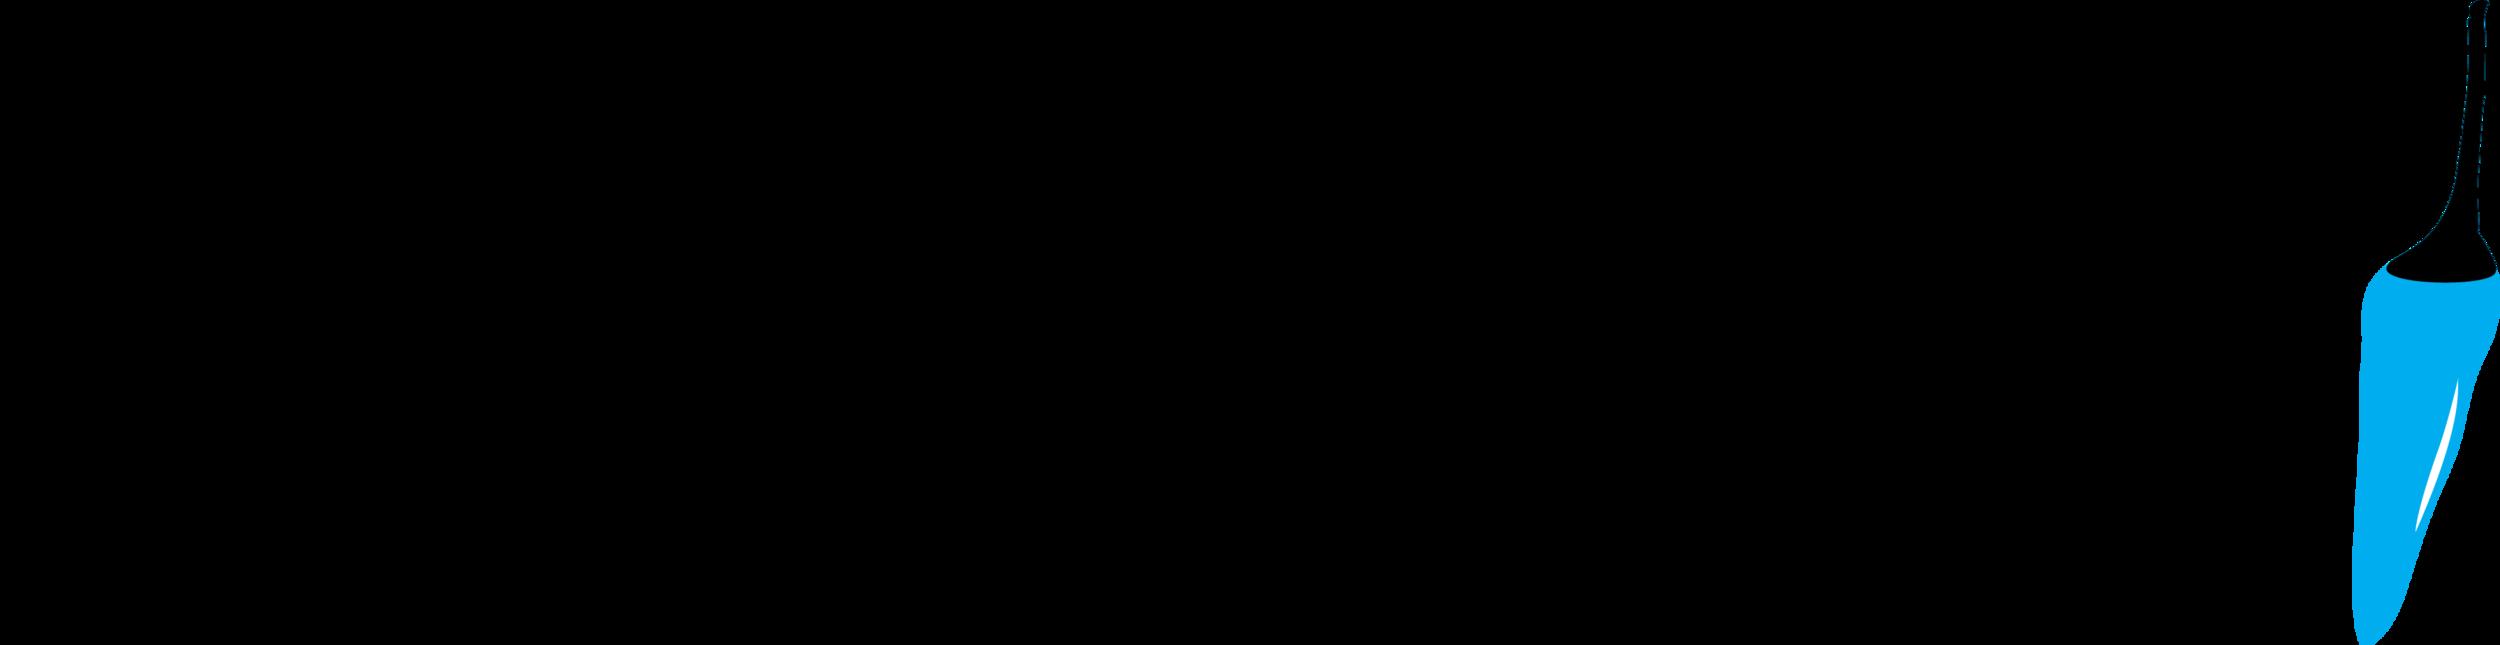 BL_BlueChilli-Logo-Centred.png